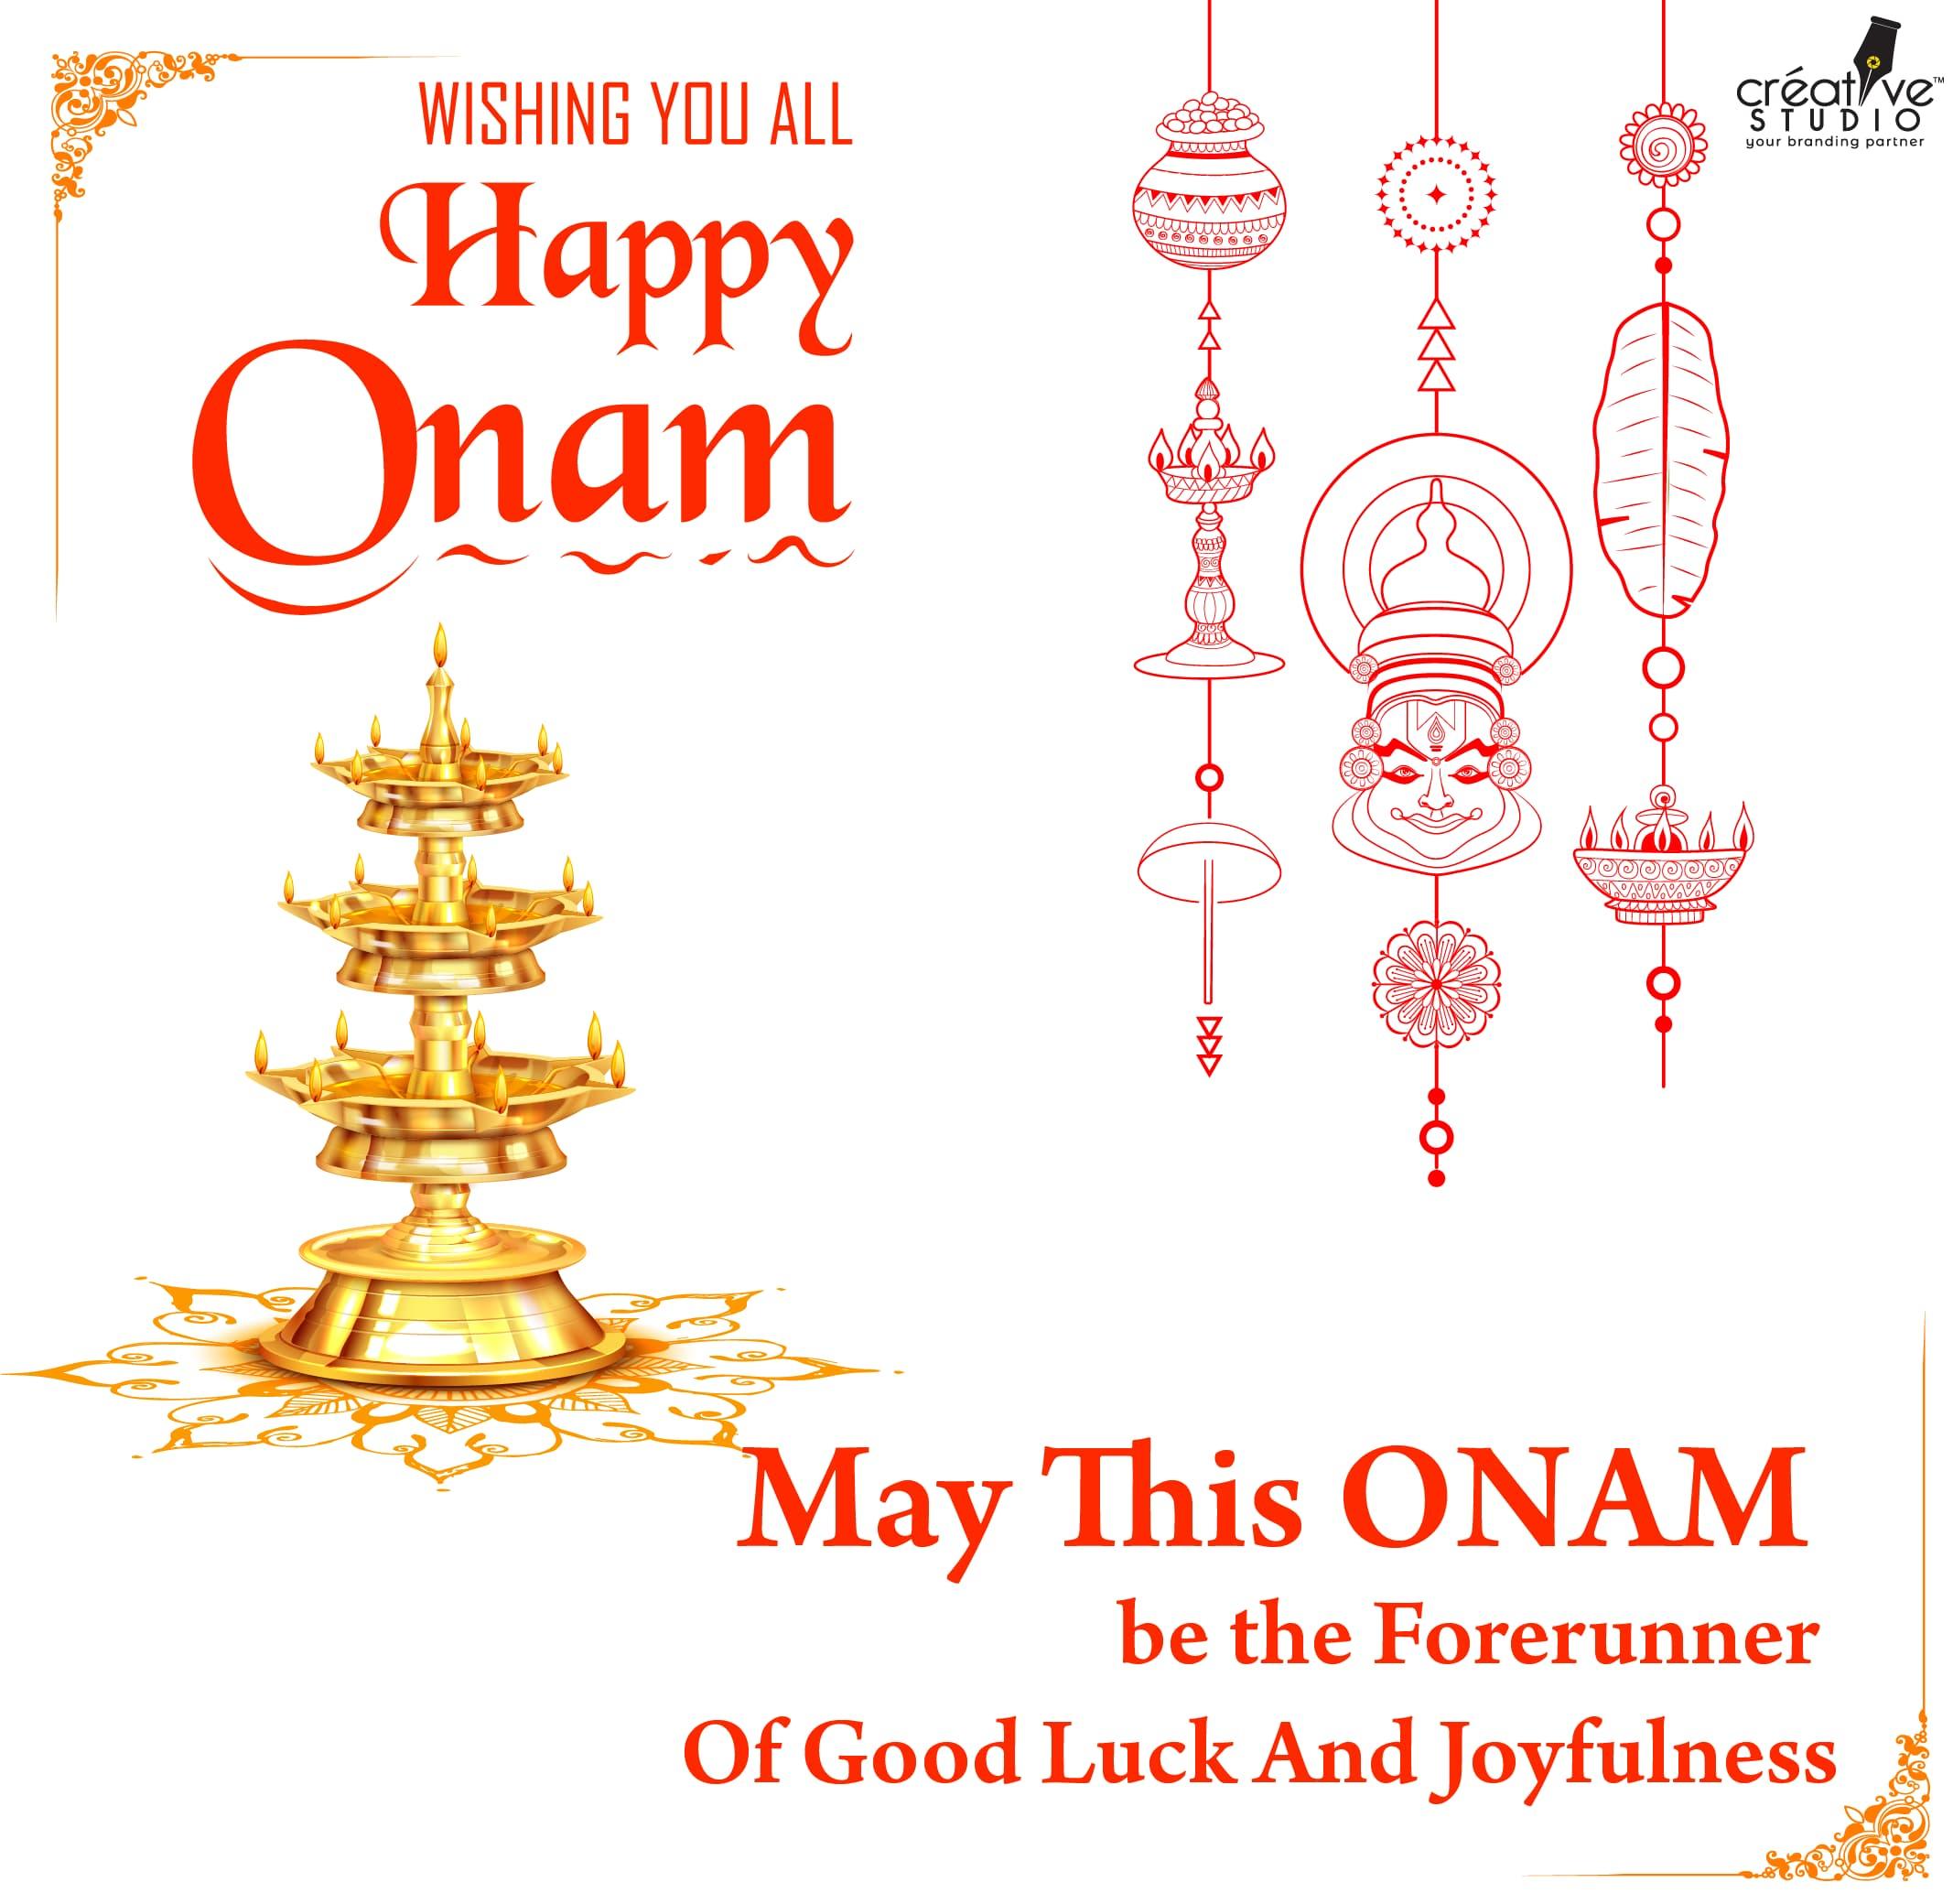 onam 05 - Happy Onam